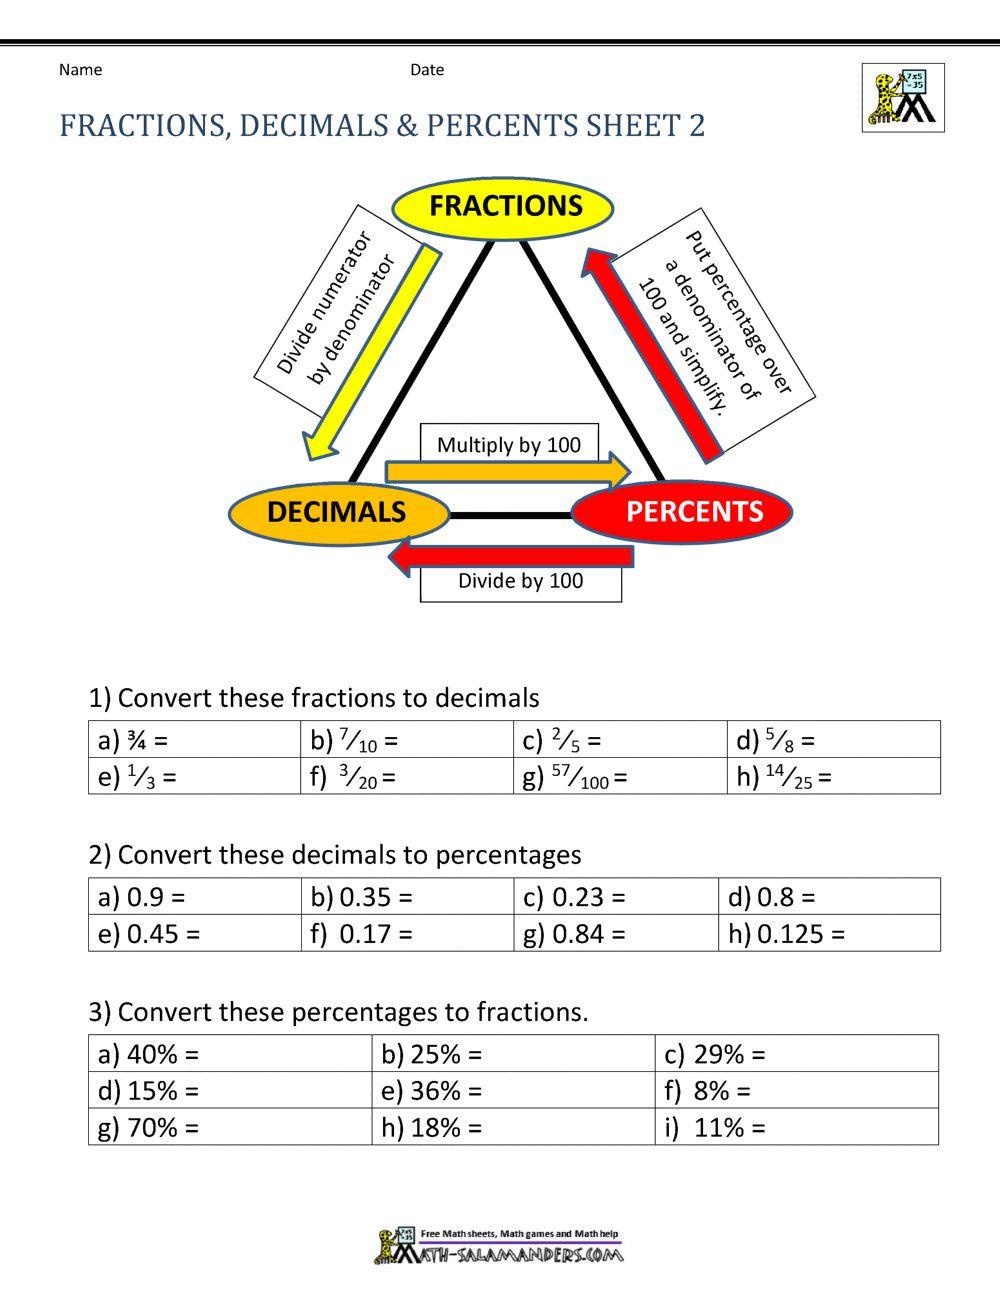 Converting Percentages To Decimals Worksheet Pdf [ 1294 x 1000 Pixel ]